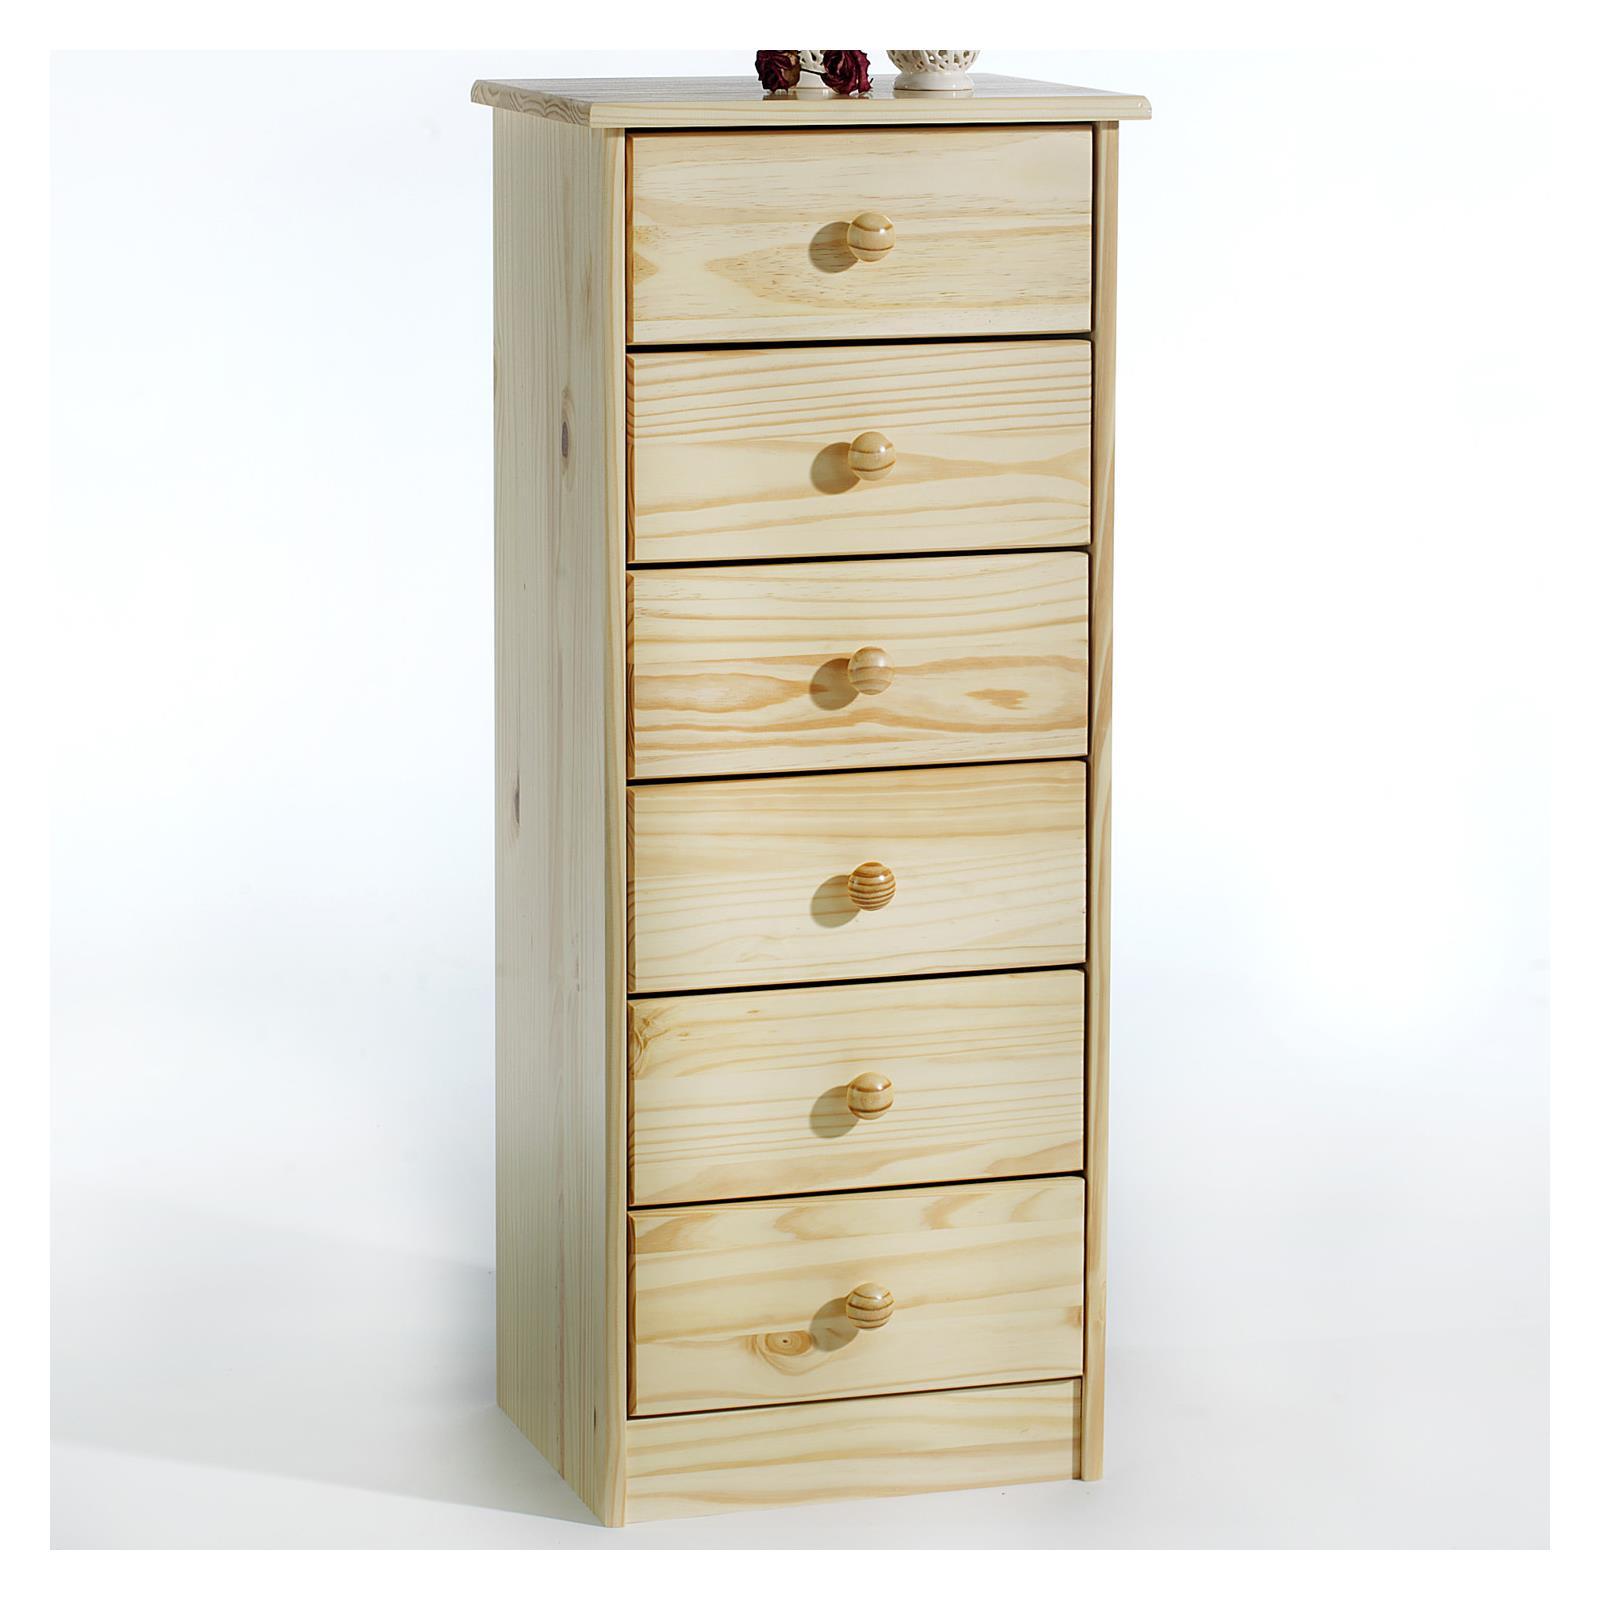 kommode rondo 6 schubladen natur mobilia24. Black Bedroom Furniture Sets. Home Design Ideas